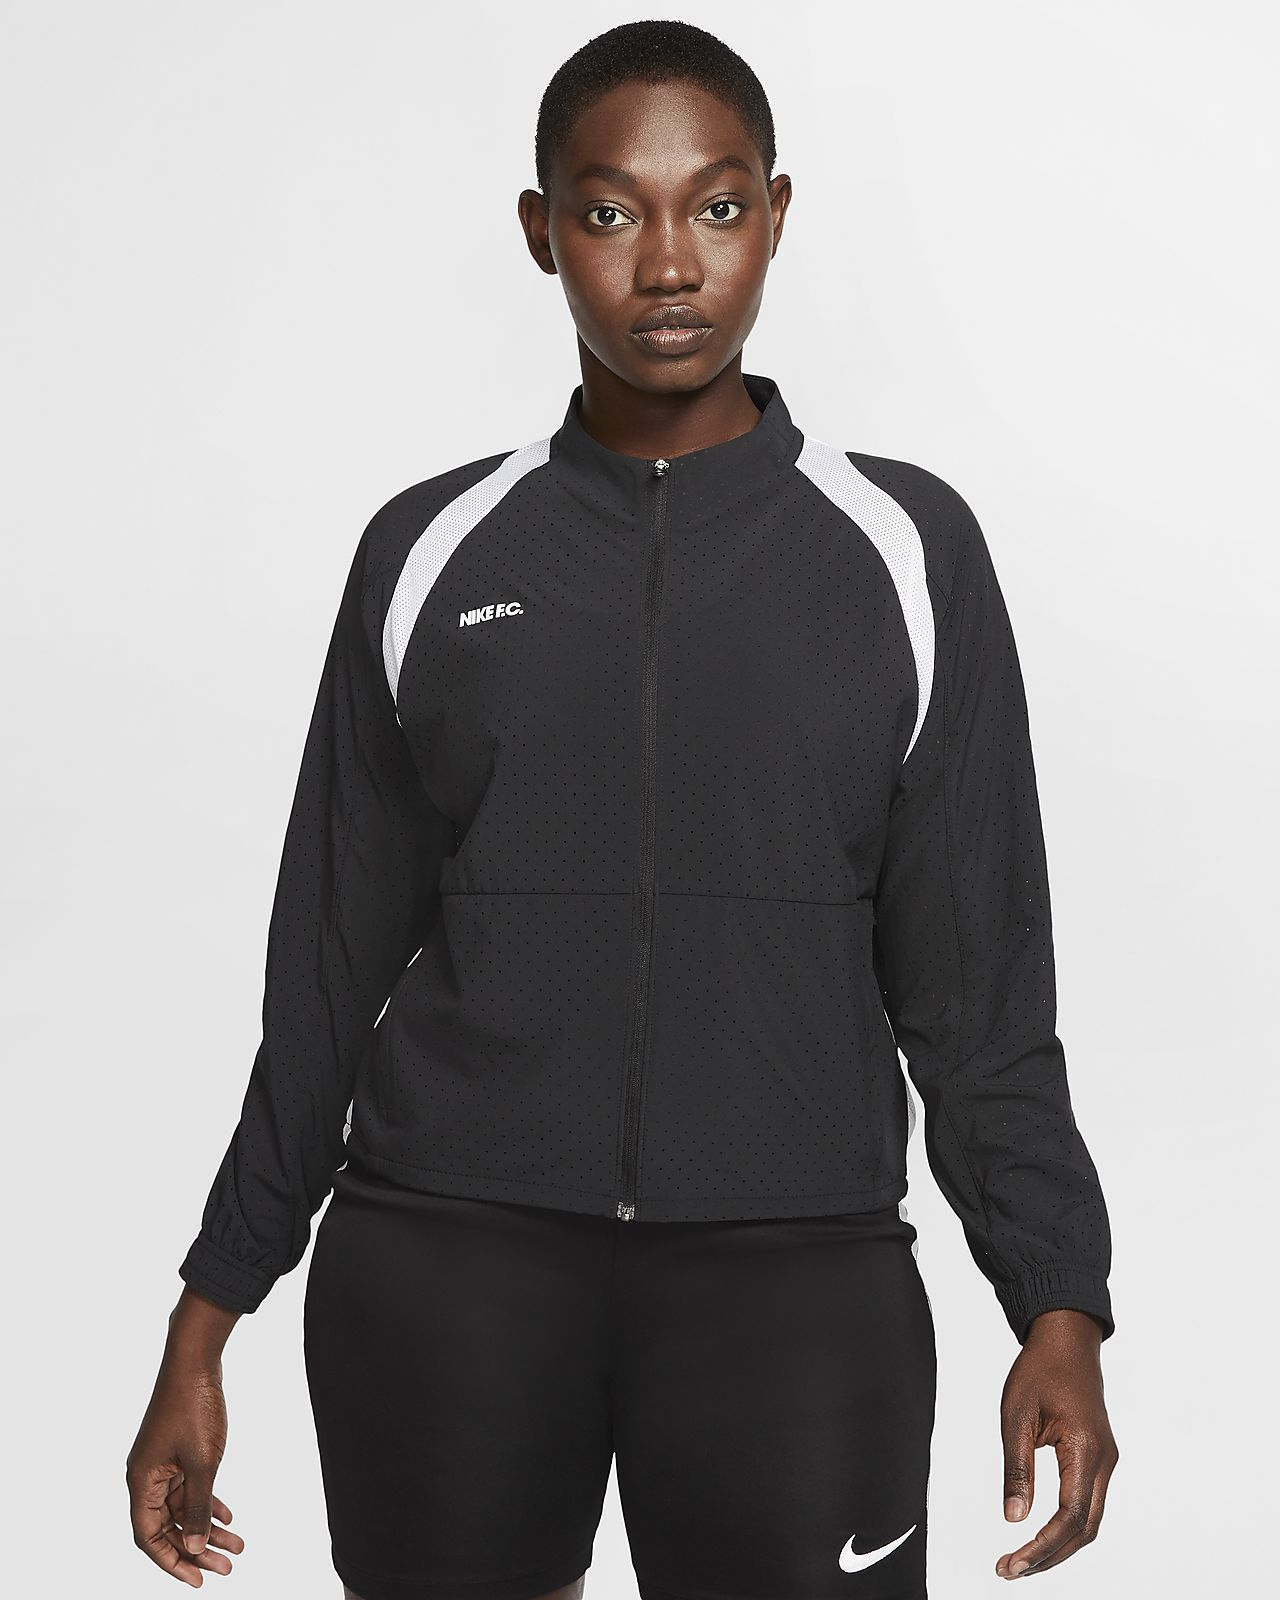 Nike F.C. Women's Full-Zip Soccer Jacket